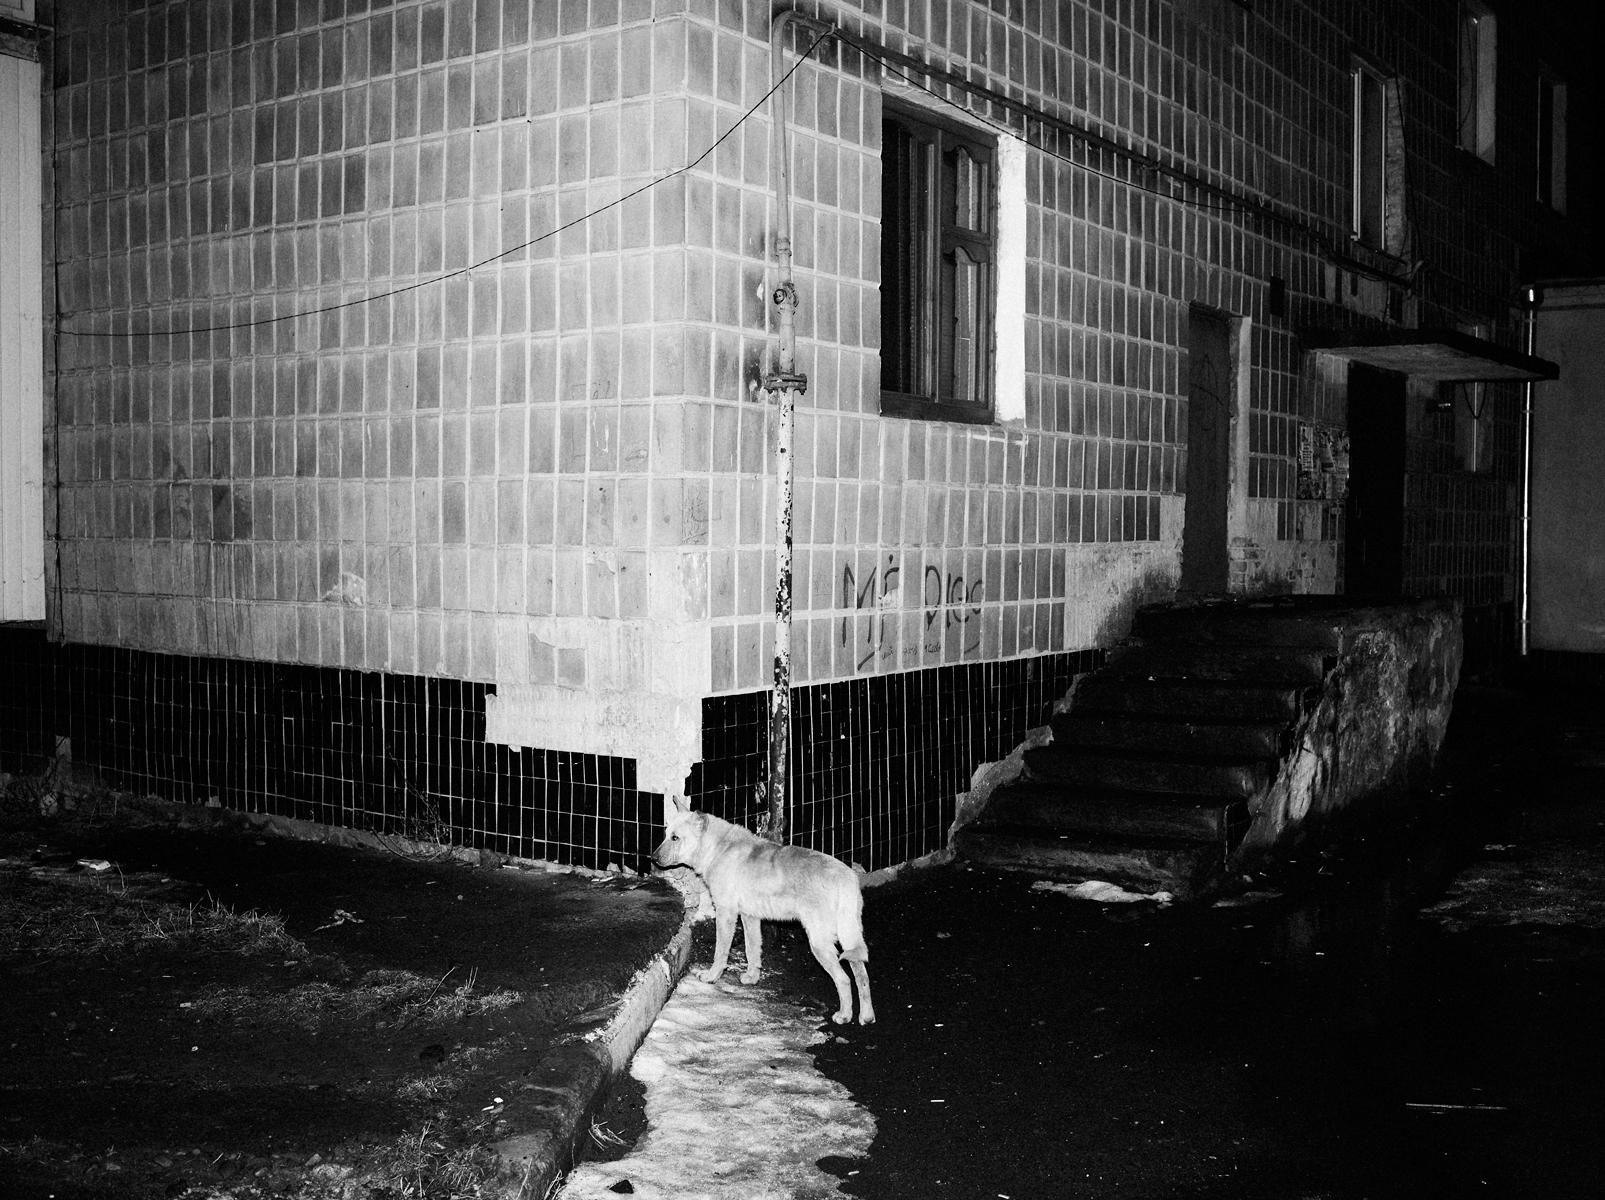 CN_Street_Dogs_016.jpg